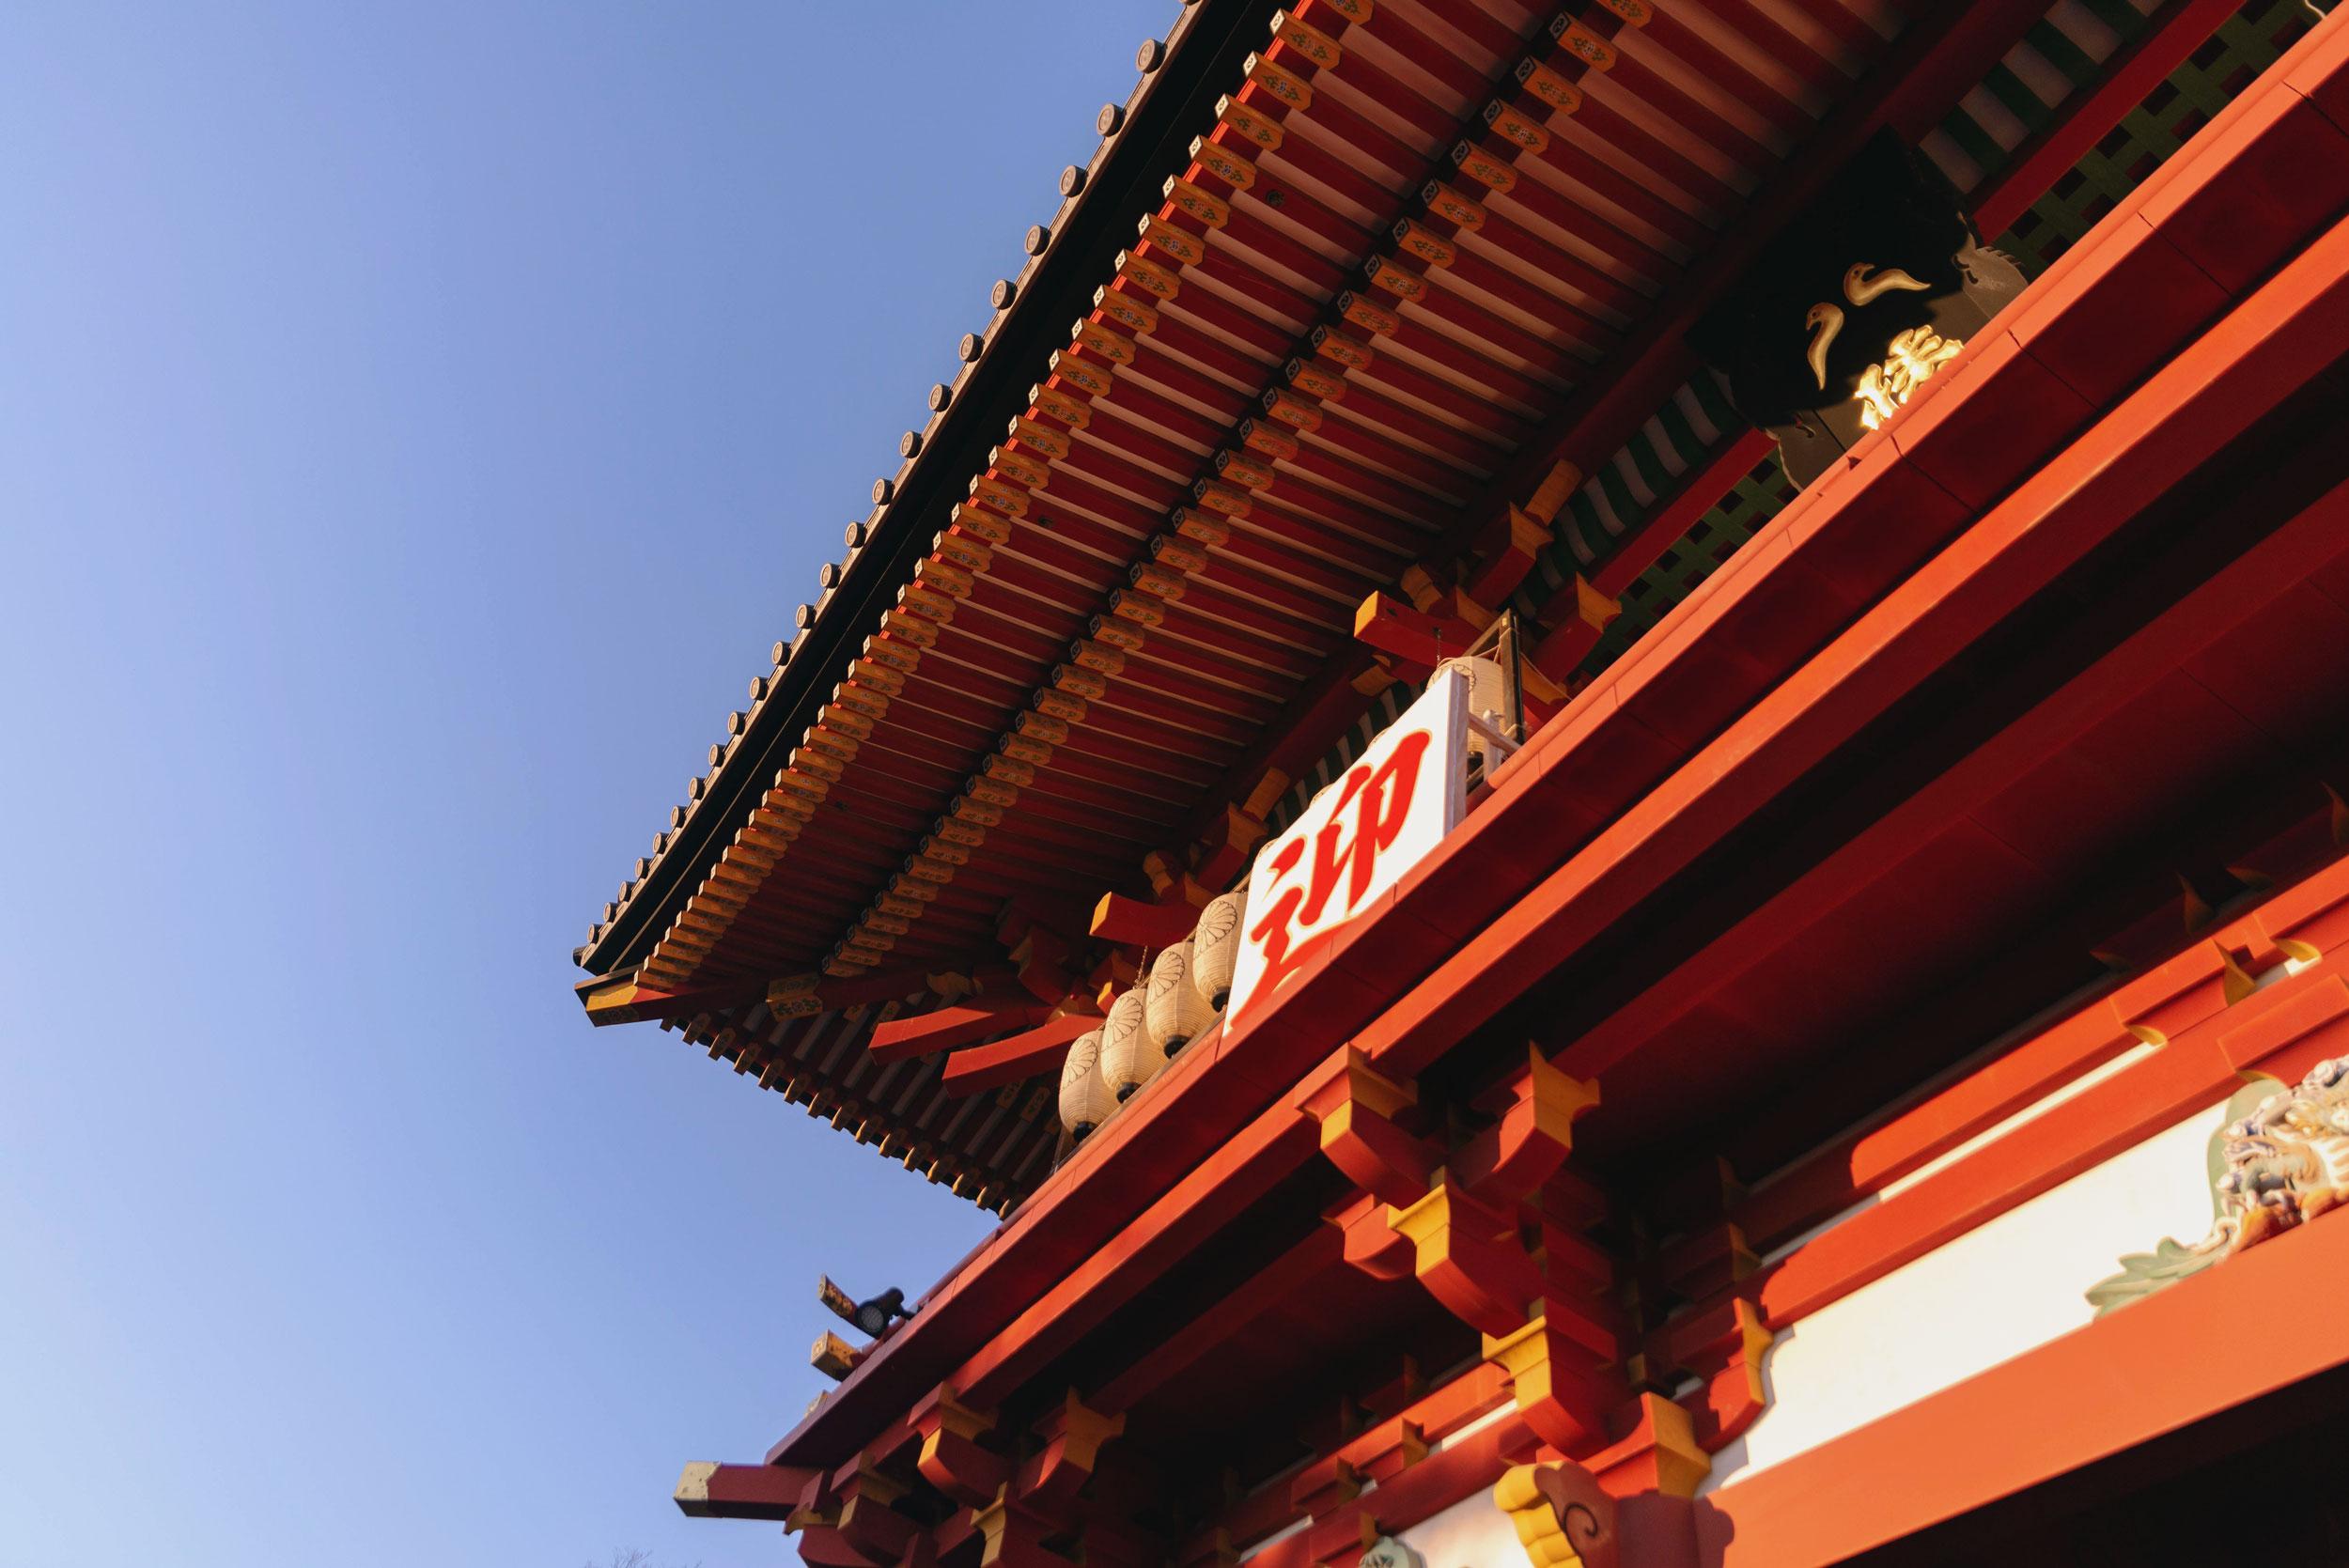 Roofline of Tsurugaoka Hachiman-gu shrine in Kamakura